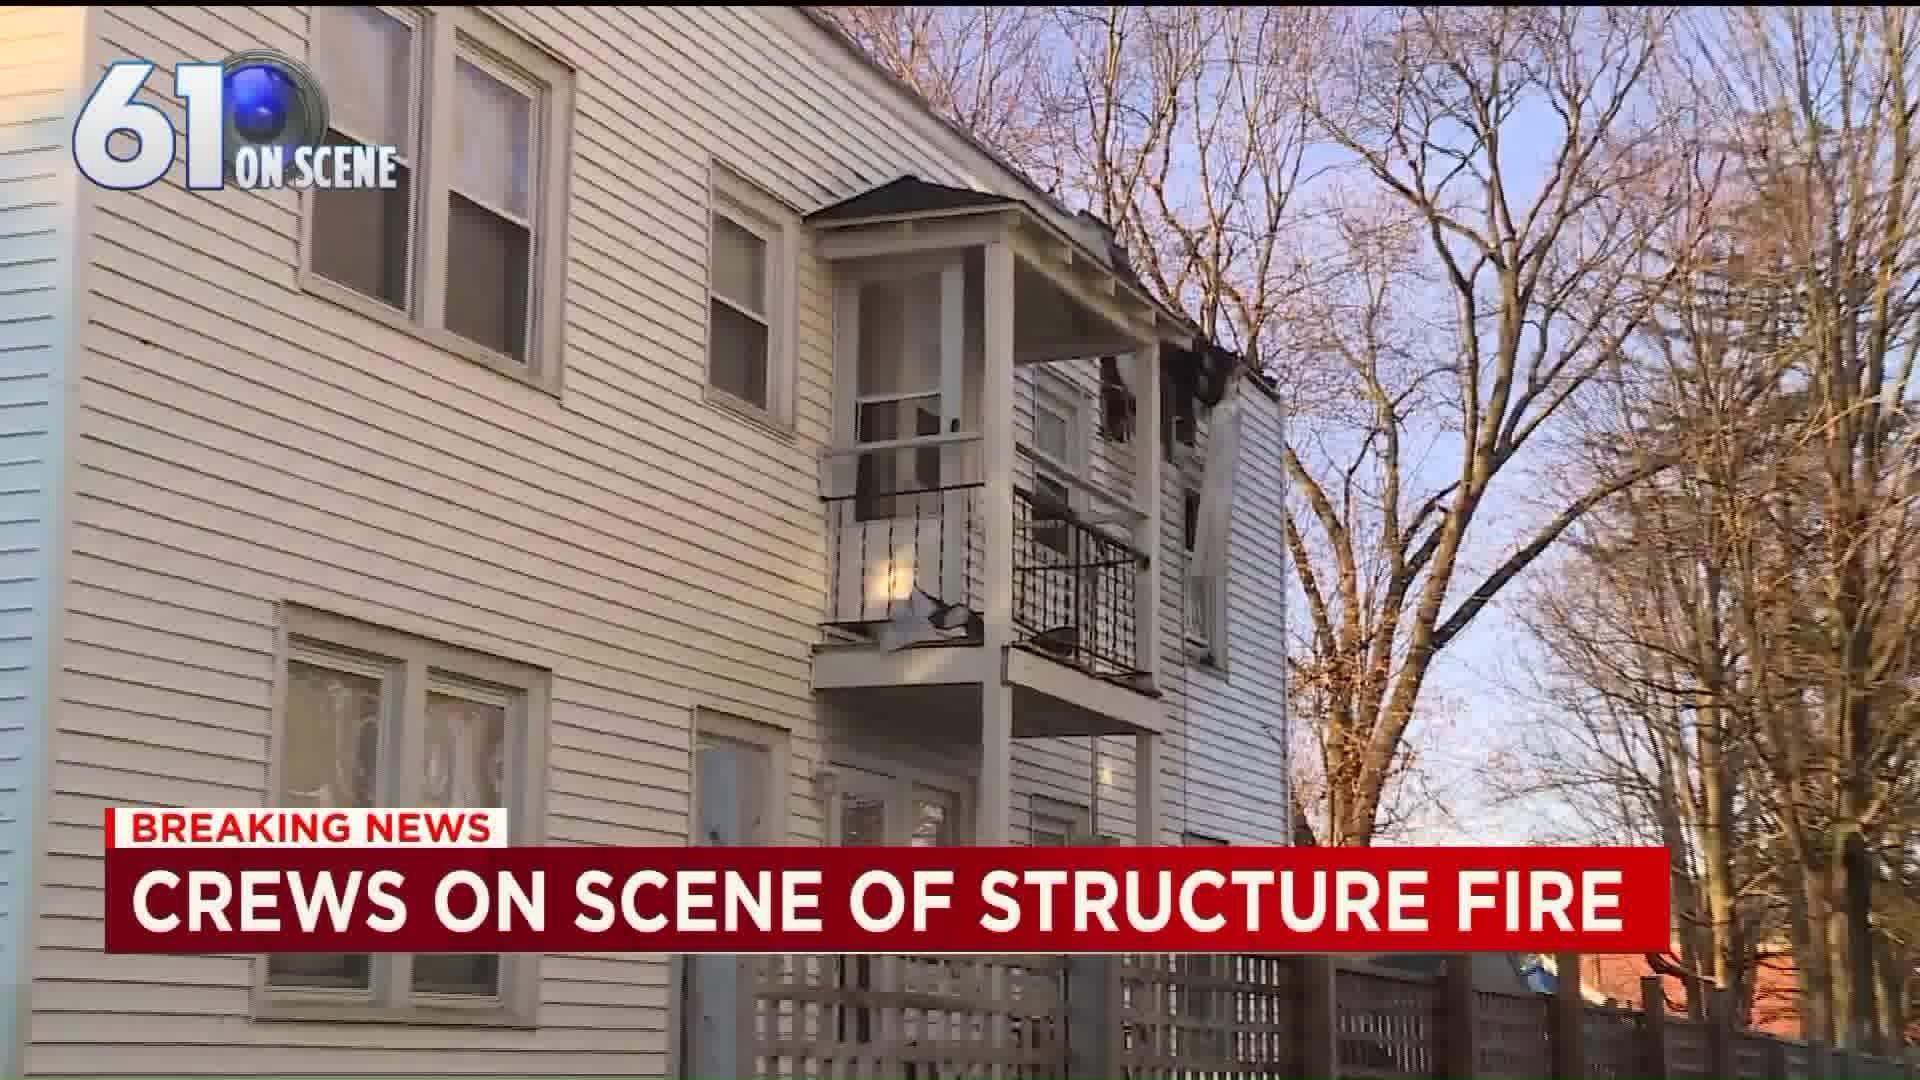 Fire crews respond to house fire in East Hartford | fox61.com